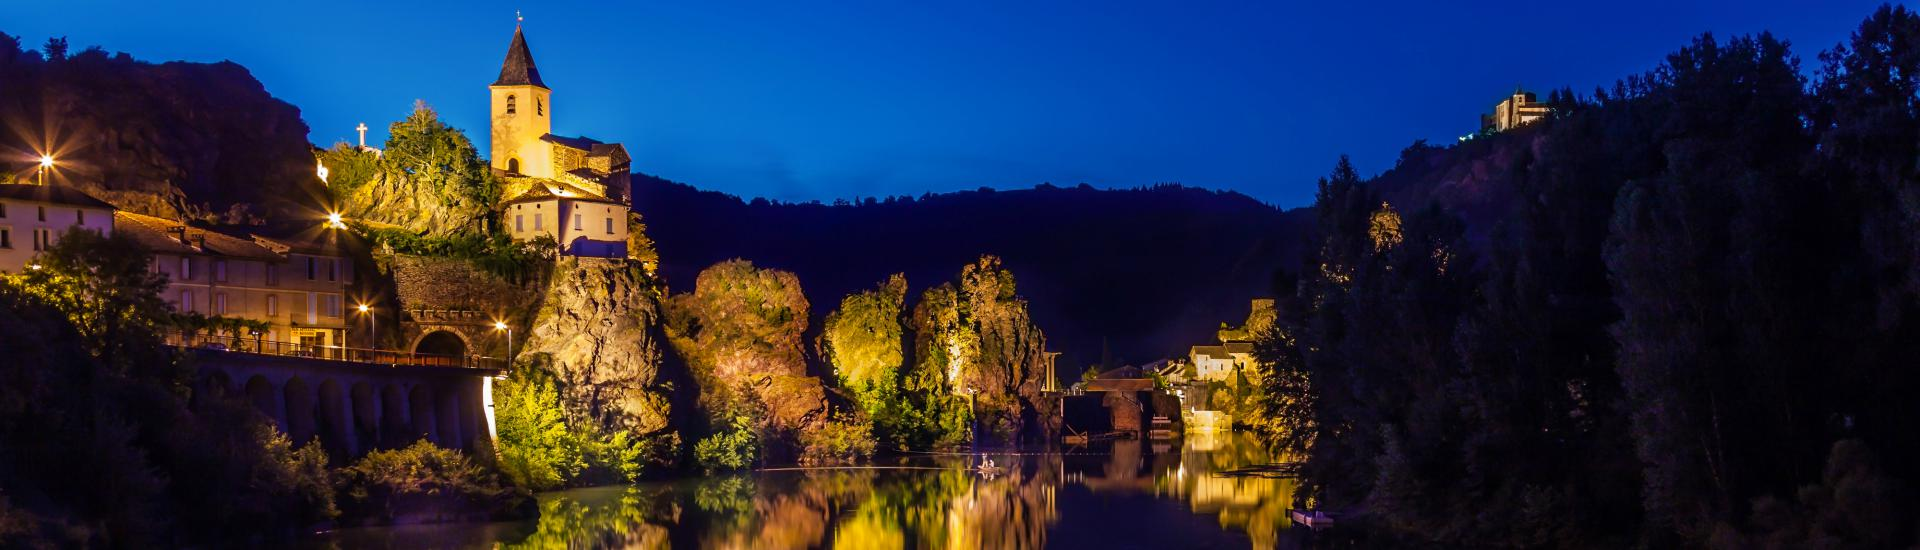 Ambialet, vallée du Tarn